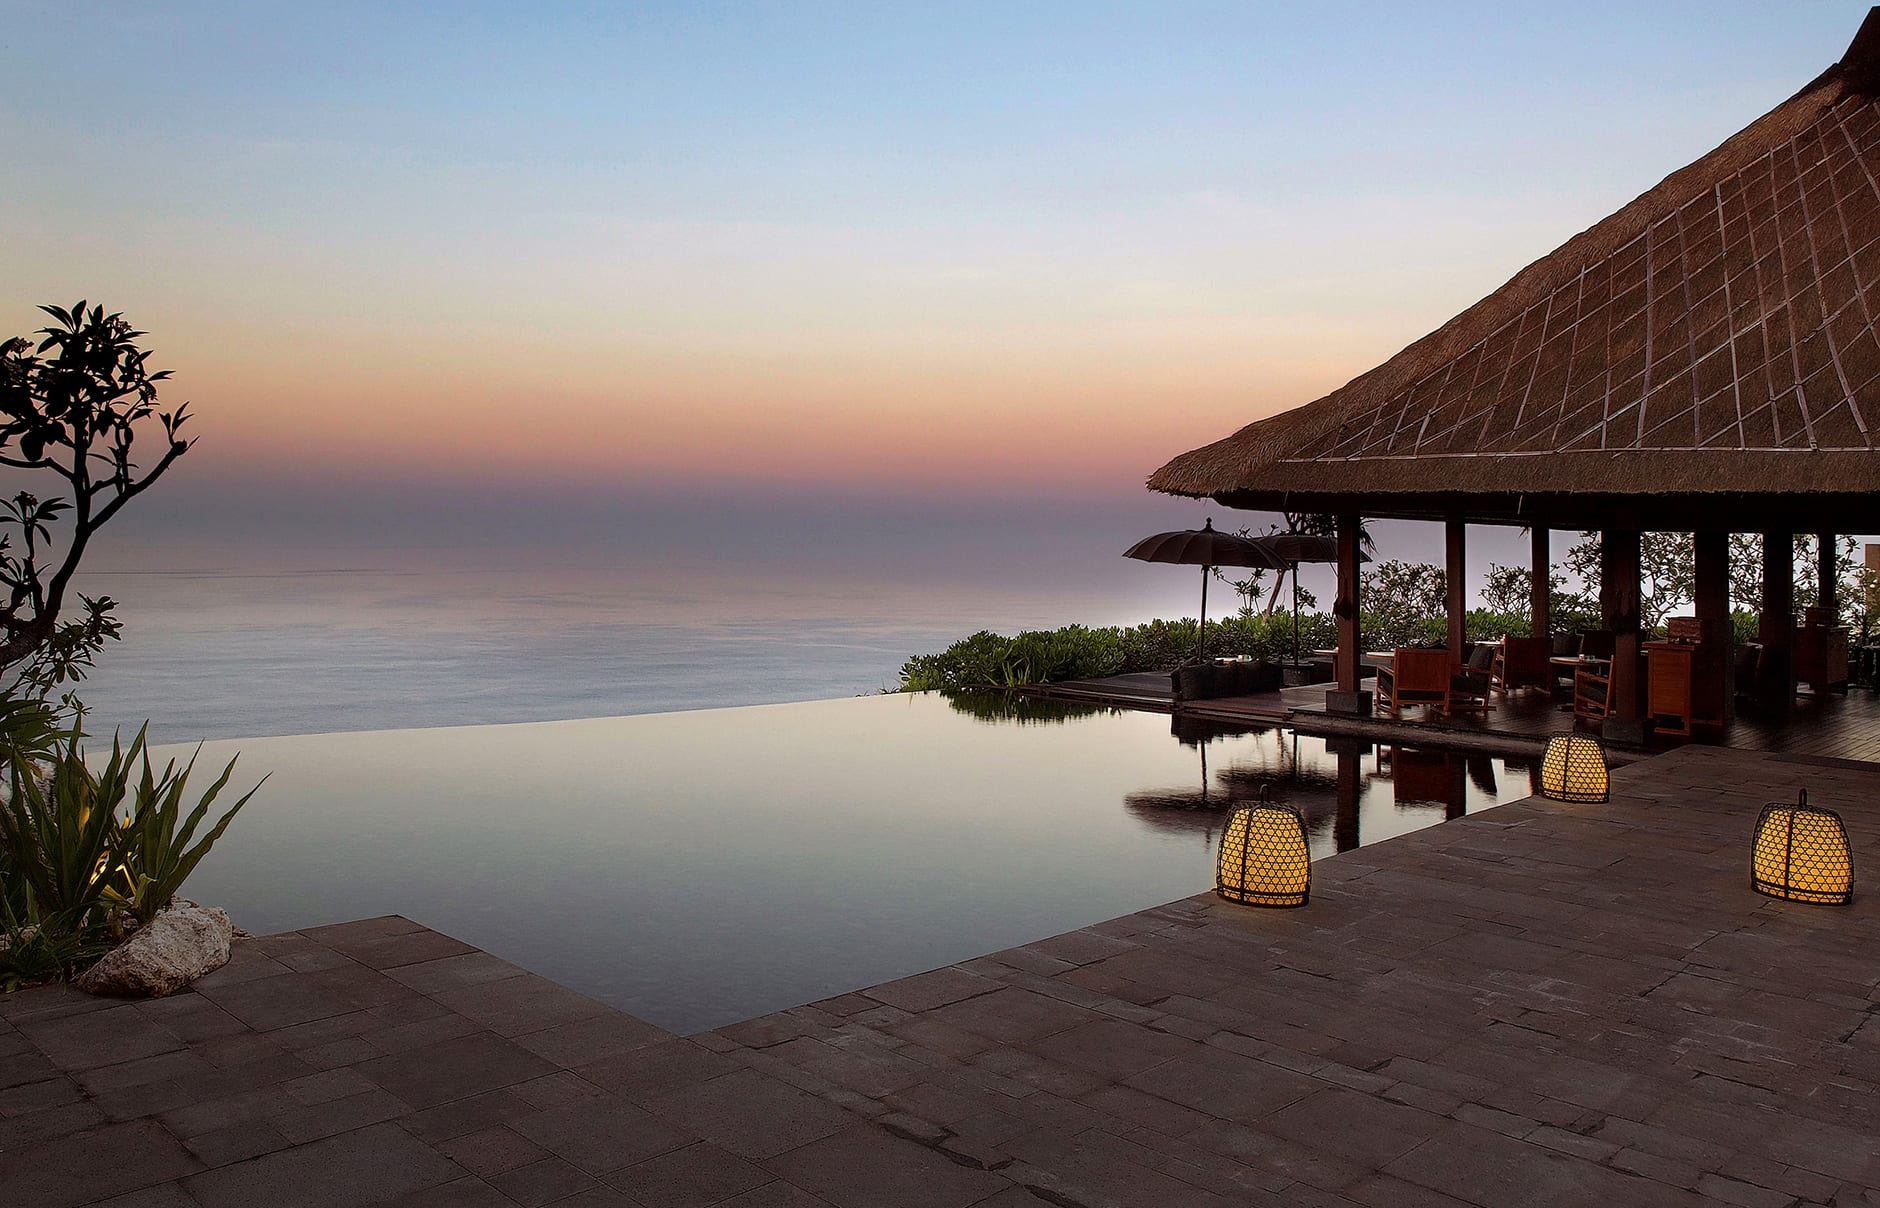 Bulgari resort bali luxury hotels travelplusstyle for Indonesia resorts bali